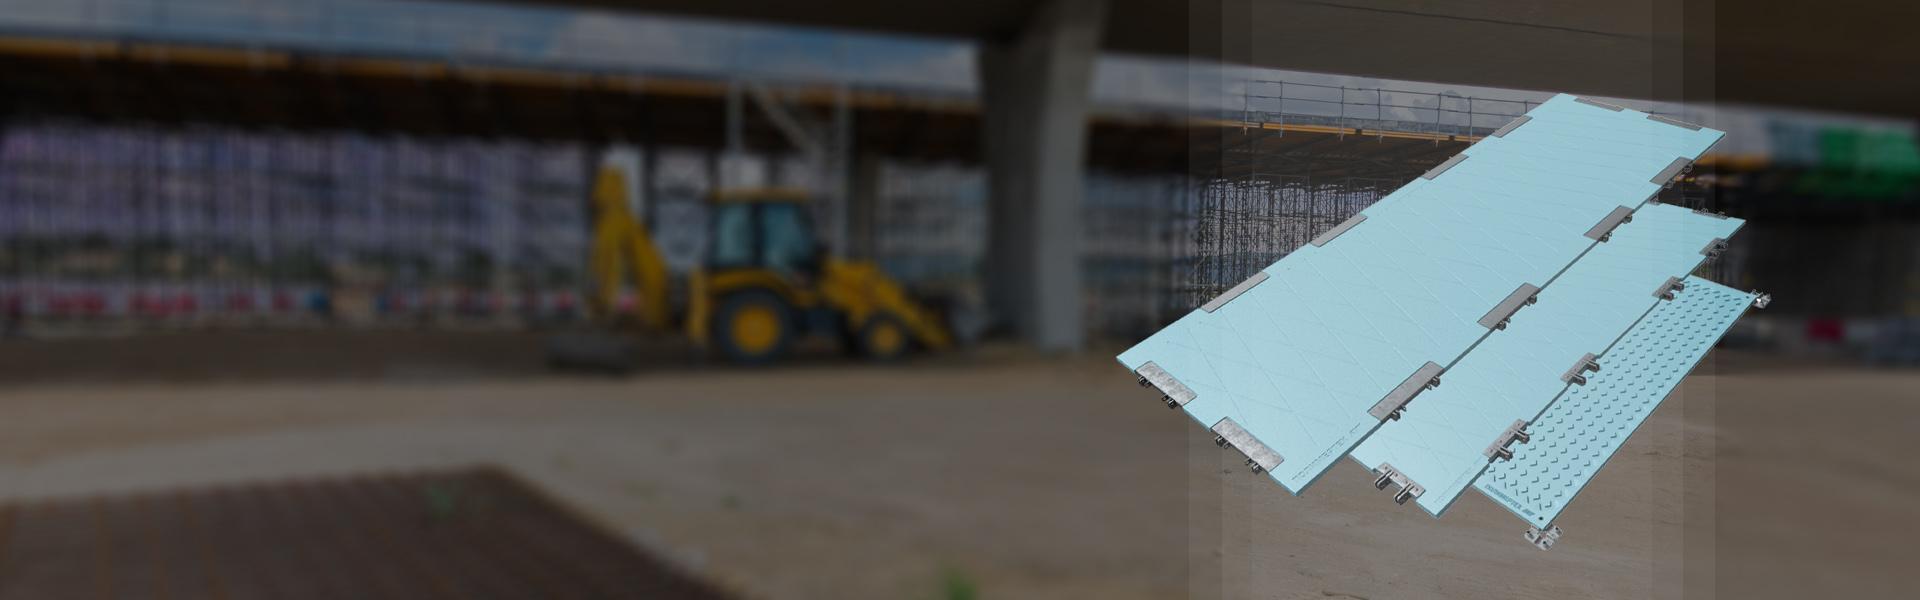 Более 40 типов конструкций для прокладки дорог<br>  в любых условиях